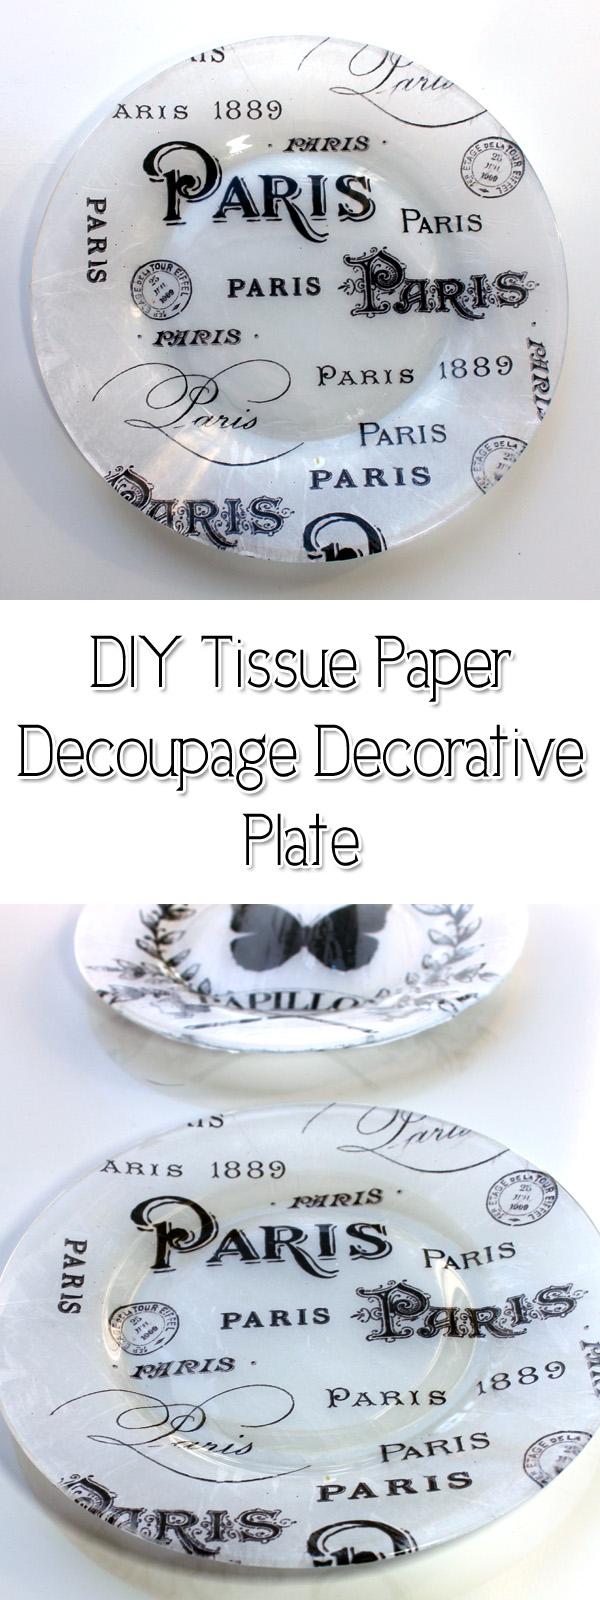 DIYTissuePaperDecoupageDecorativePlate-10